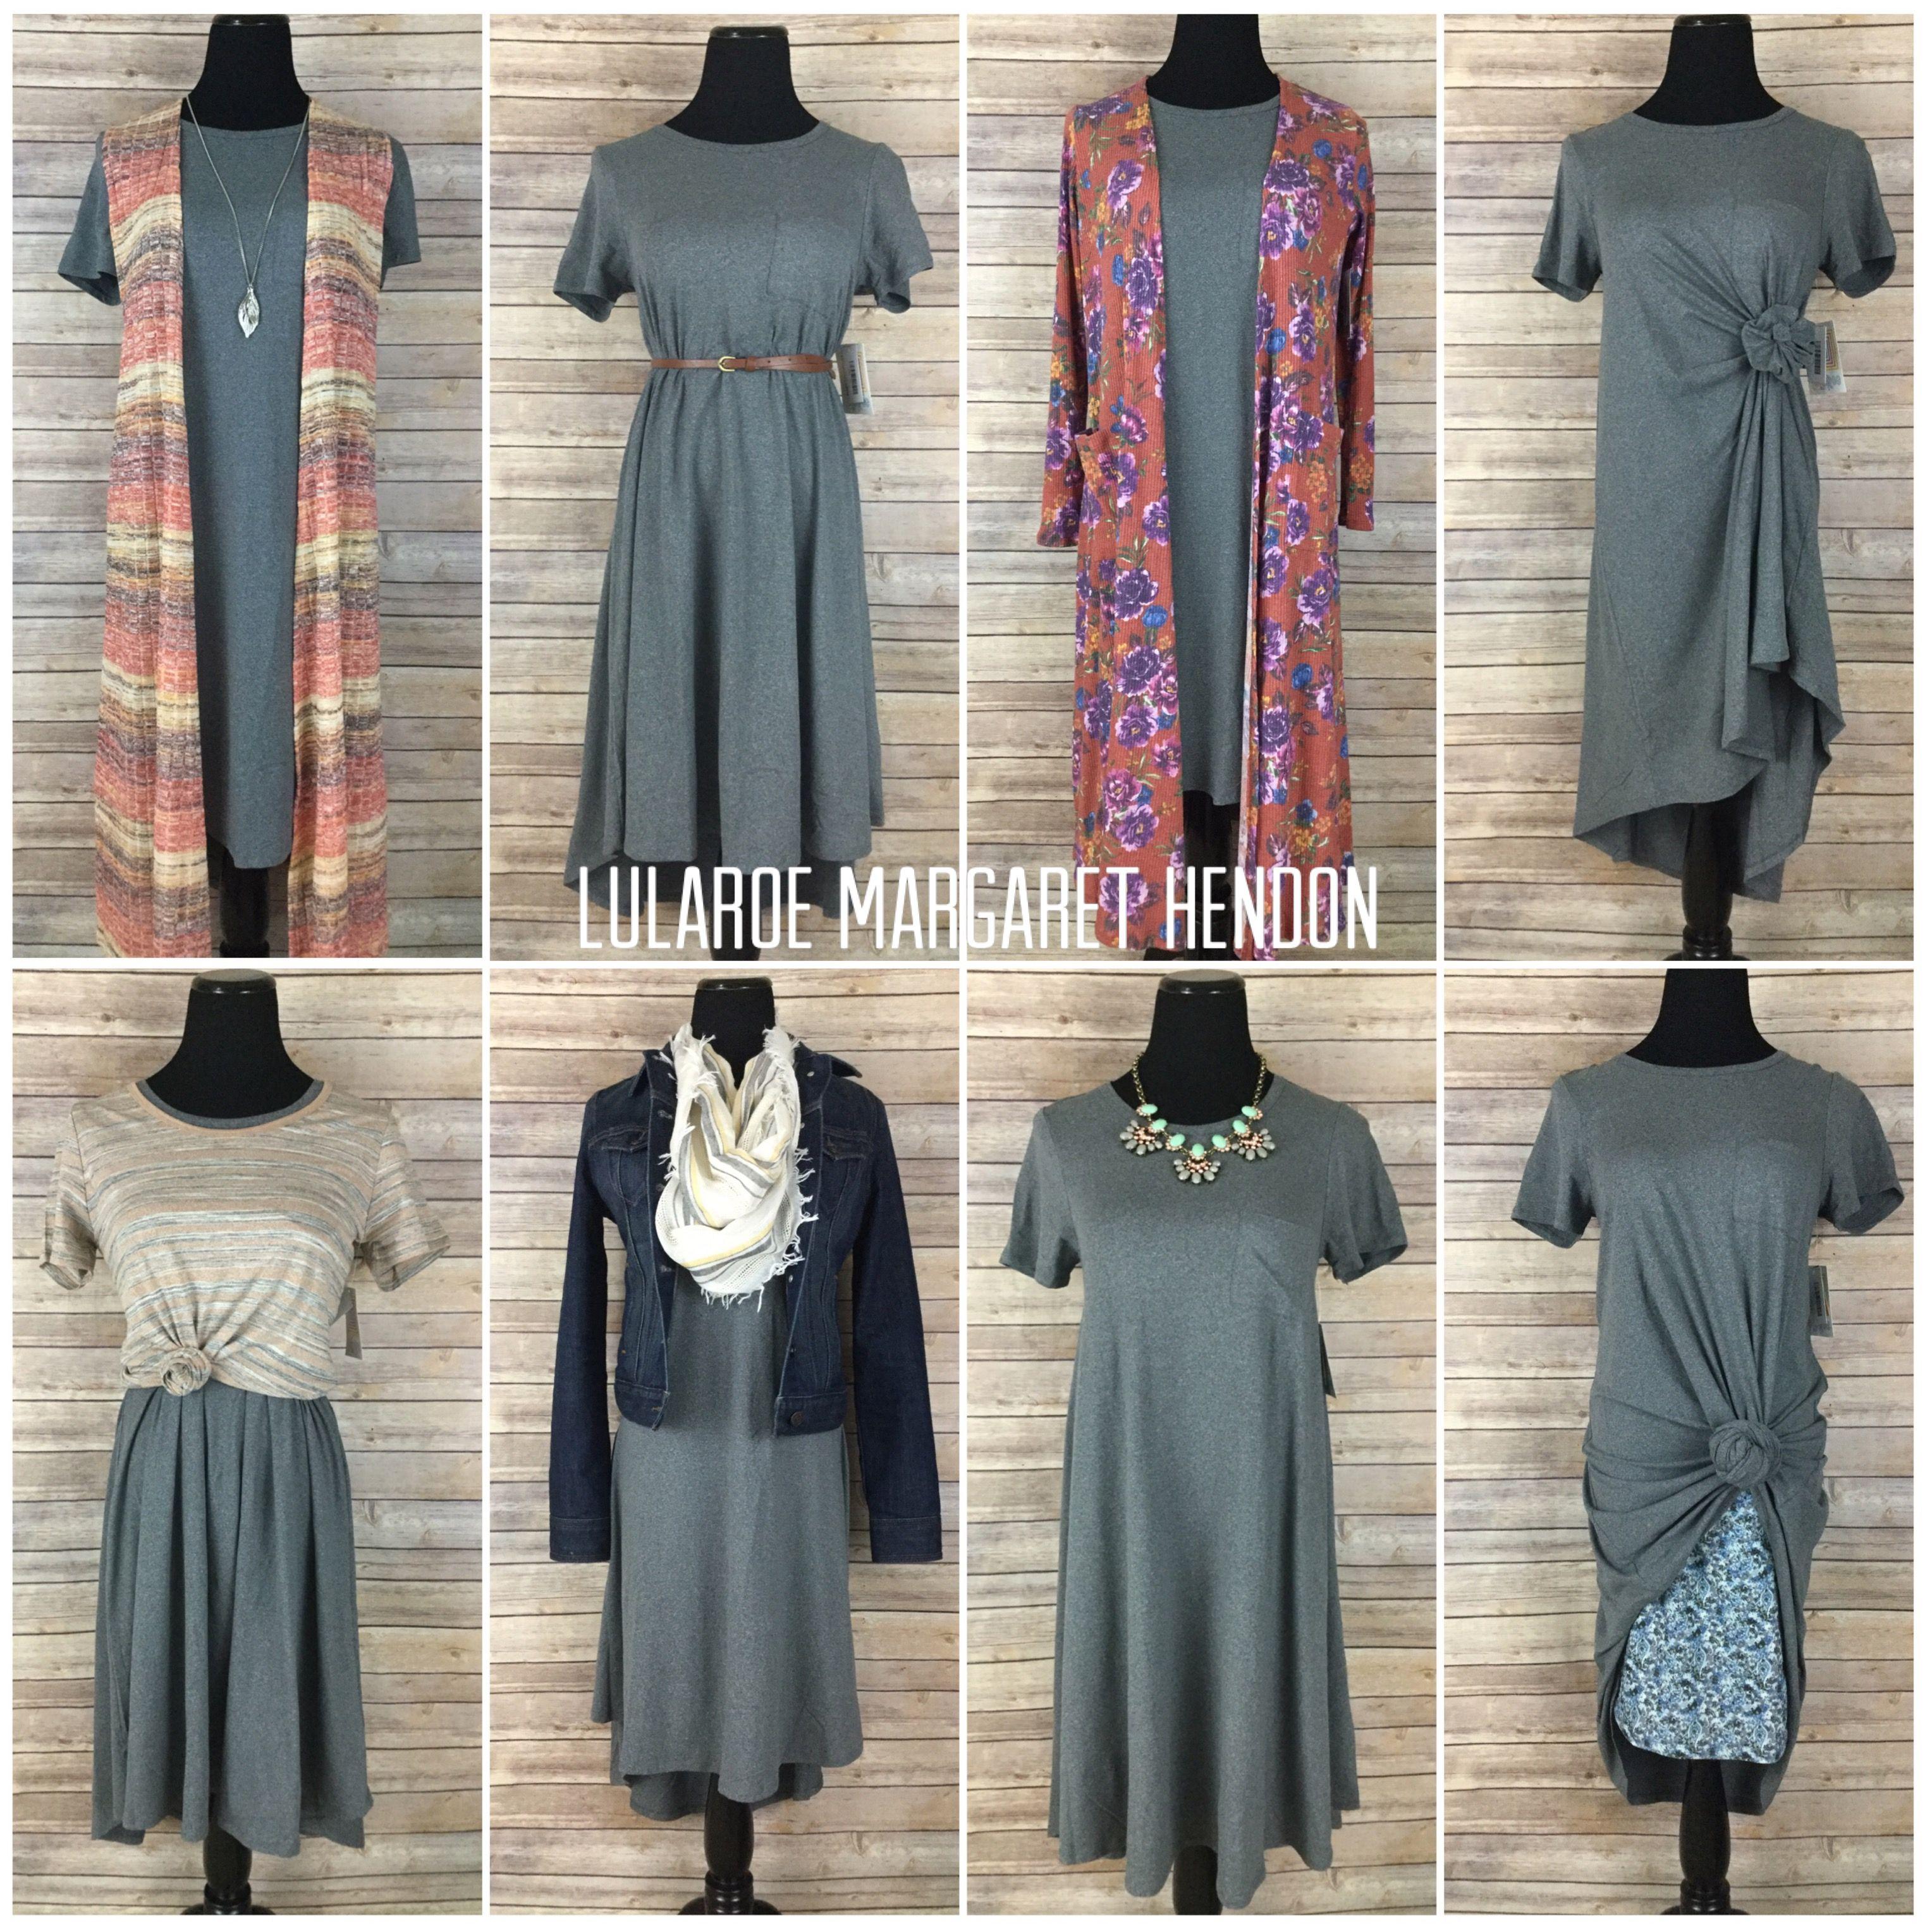 50++ Lularoe carly dress ideas